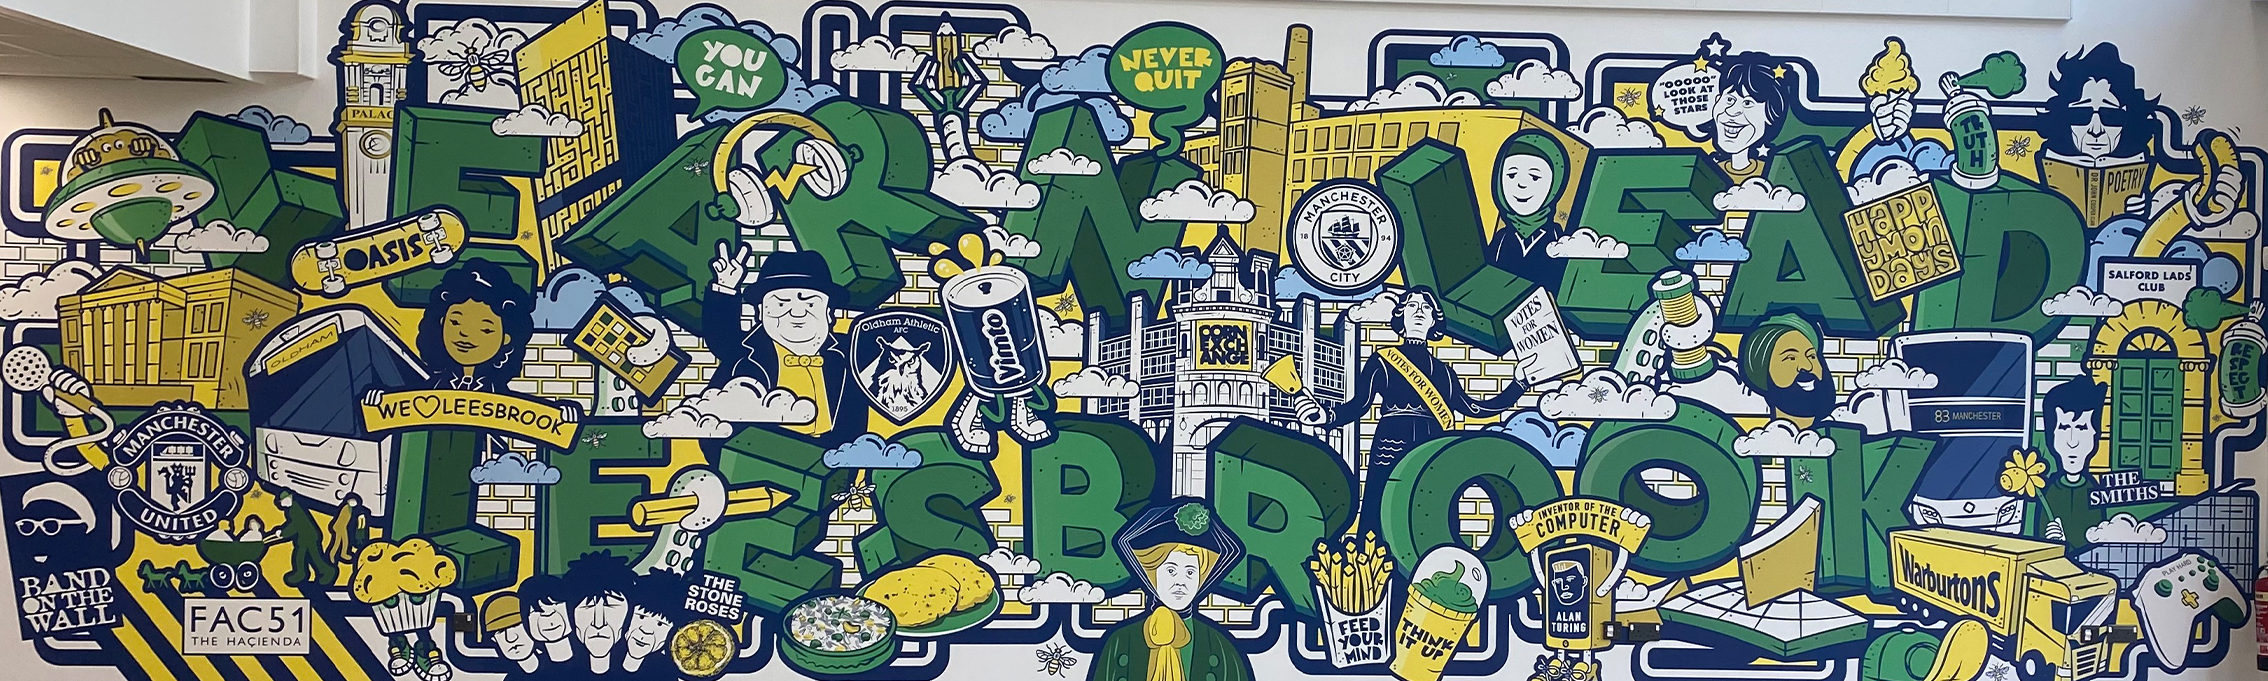 Leesbrook Mural